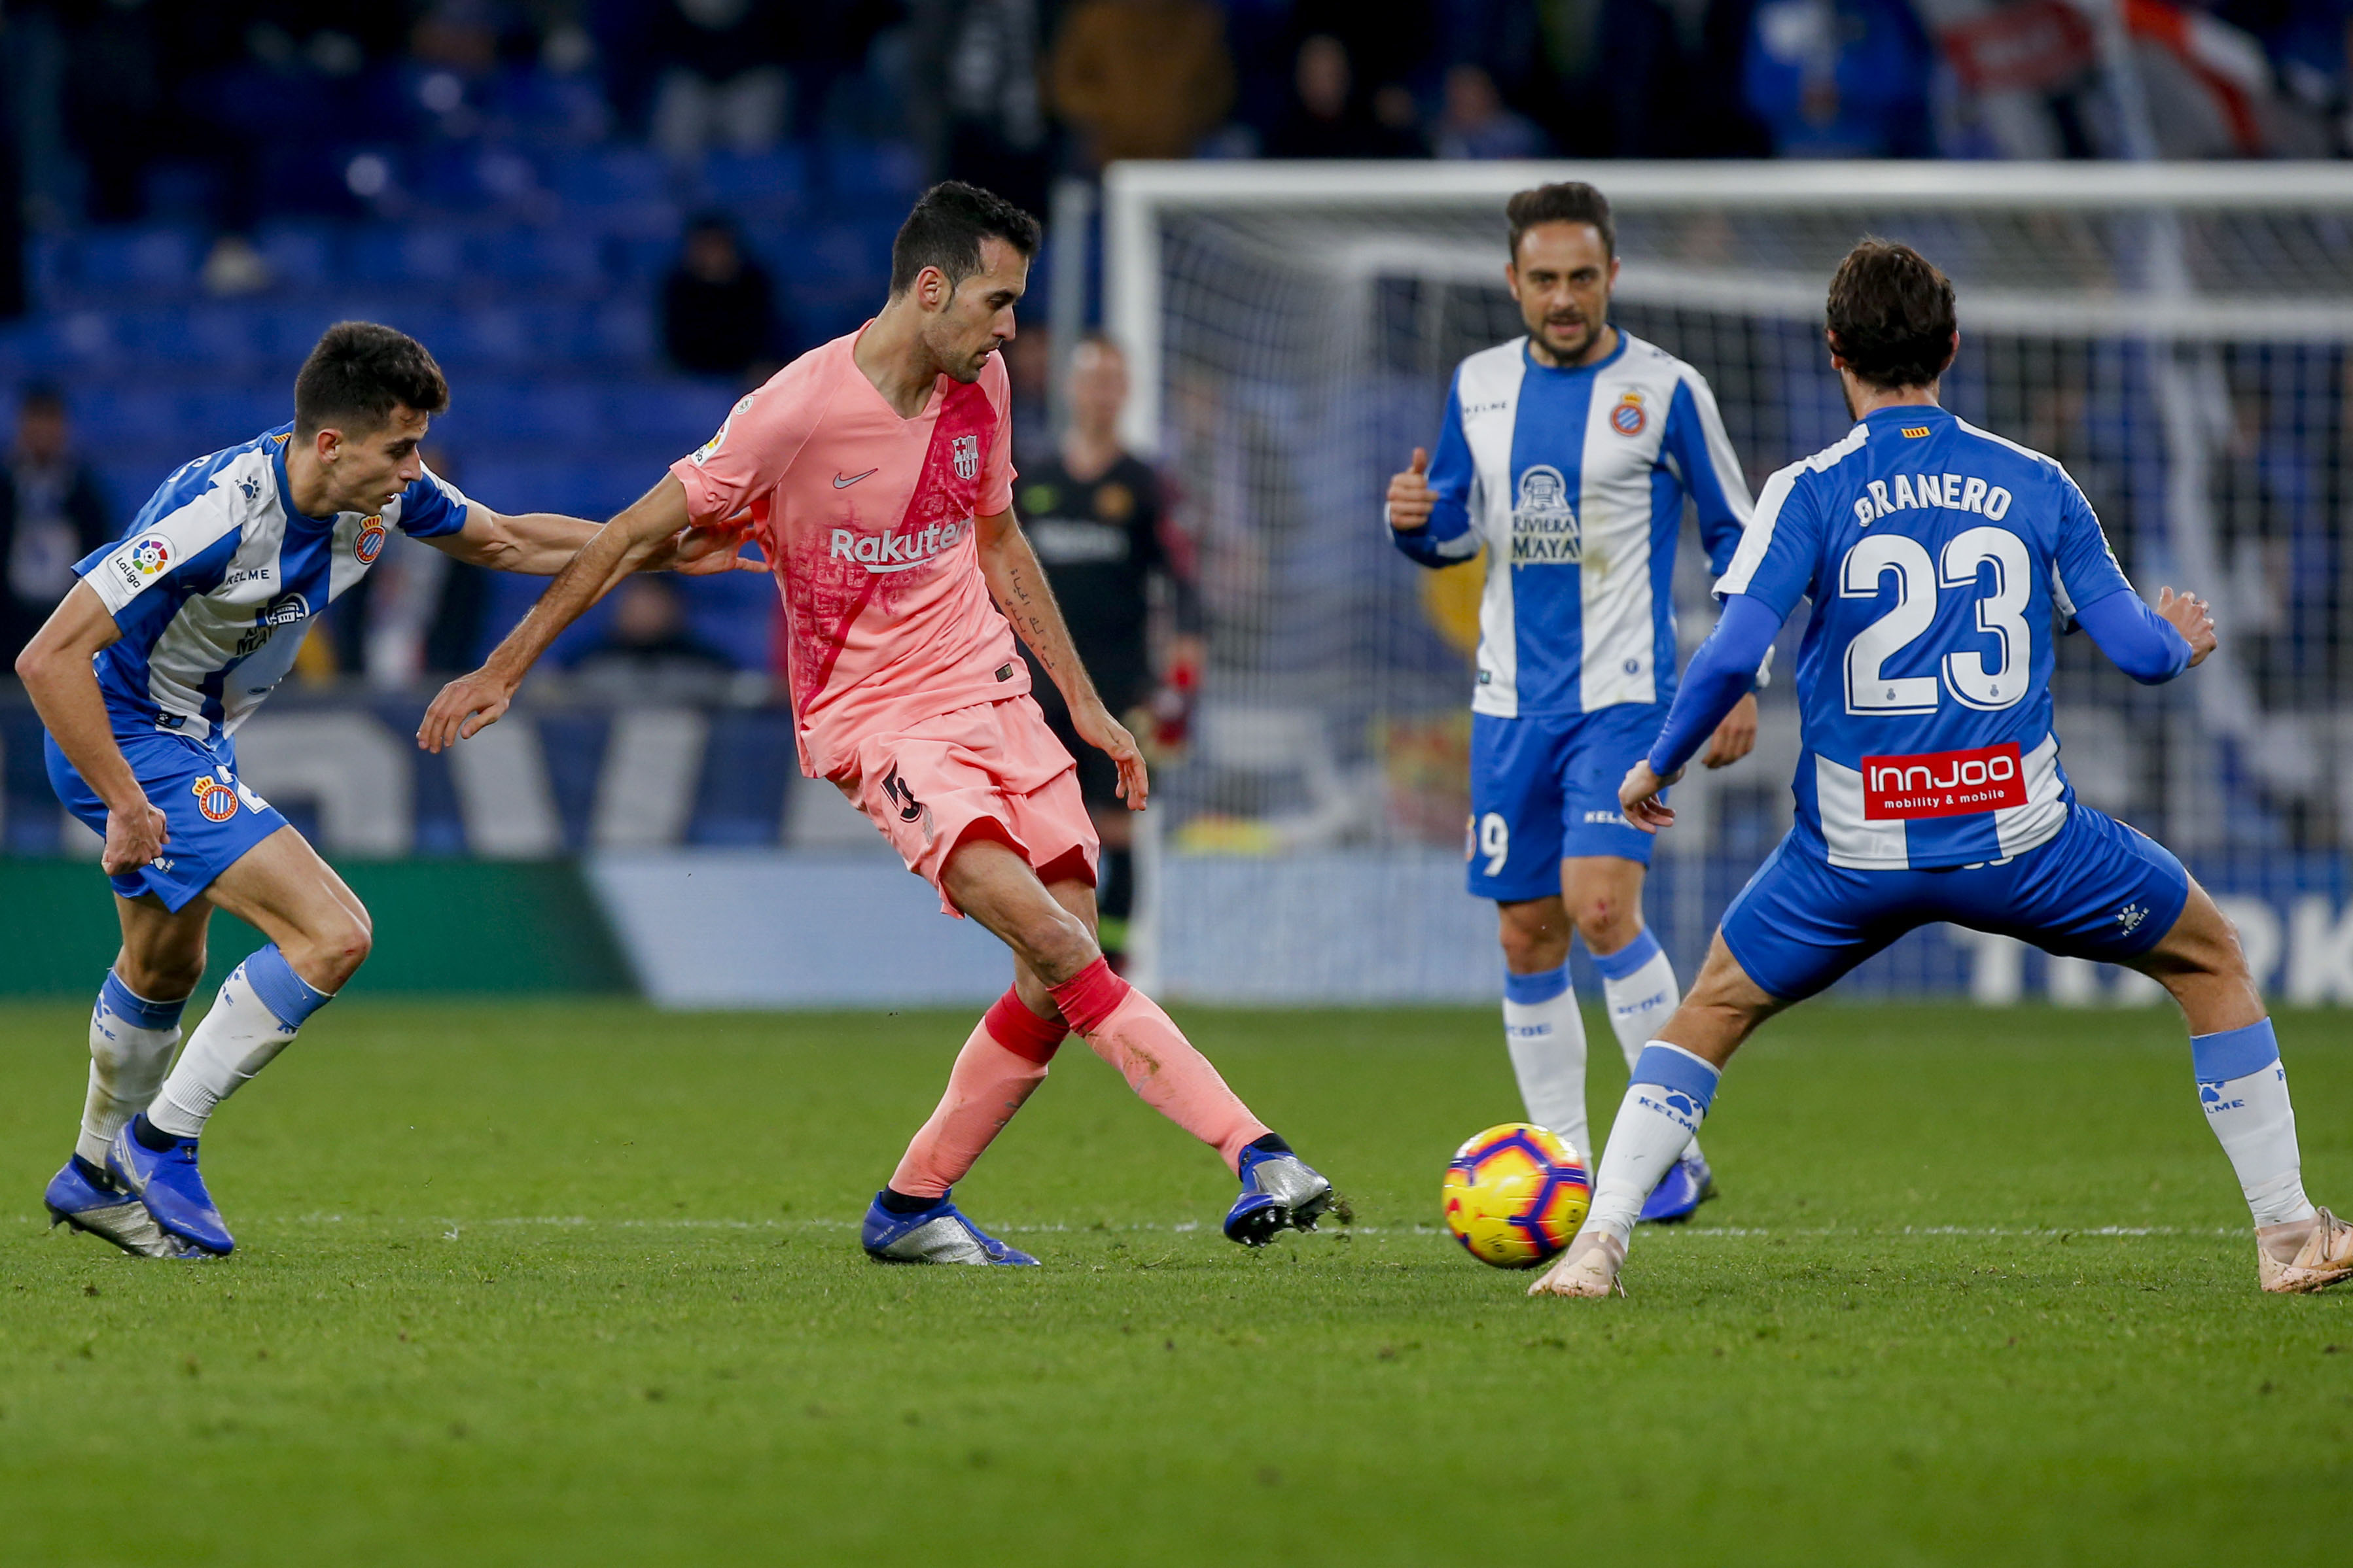 FC Barcelona midfielder Sergio Busquets (center) kicks the ball through RCD Espanyol forward Granero (23) during the Spanish La Liga soccer match between Espanyol and FC Barcelona at RCDE stadium in Cornella Llobregat, Spain on Saturday.